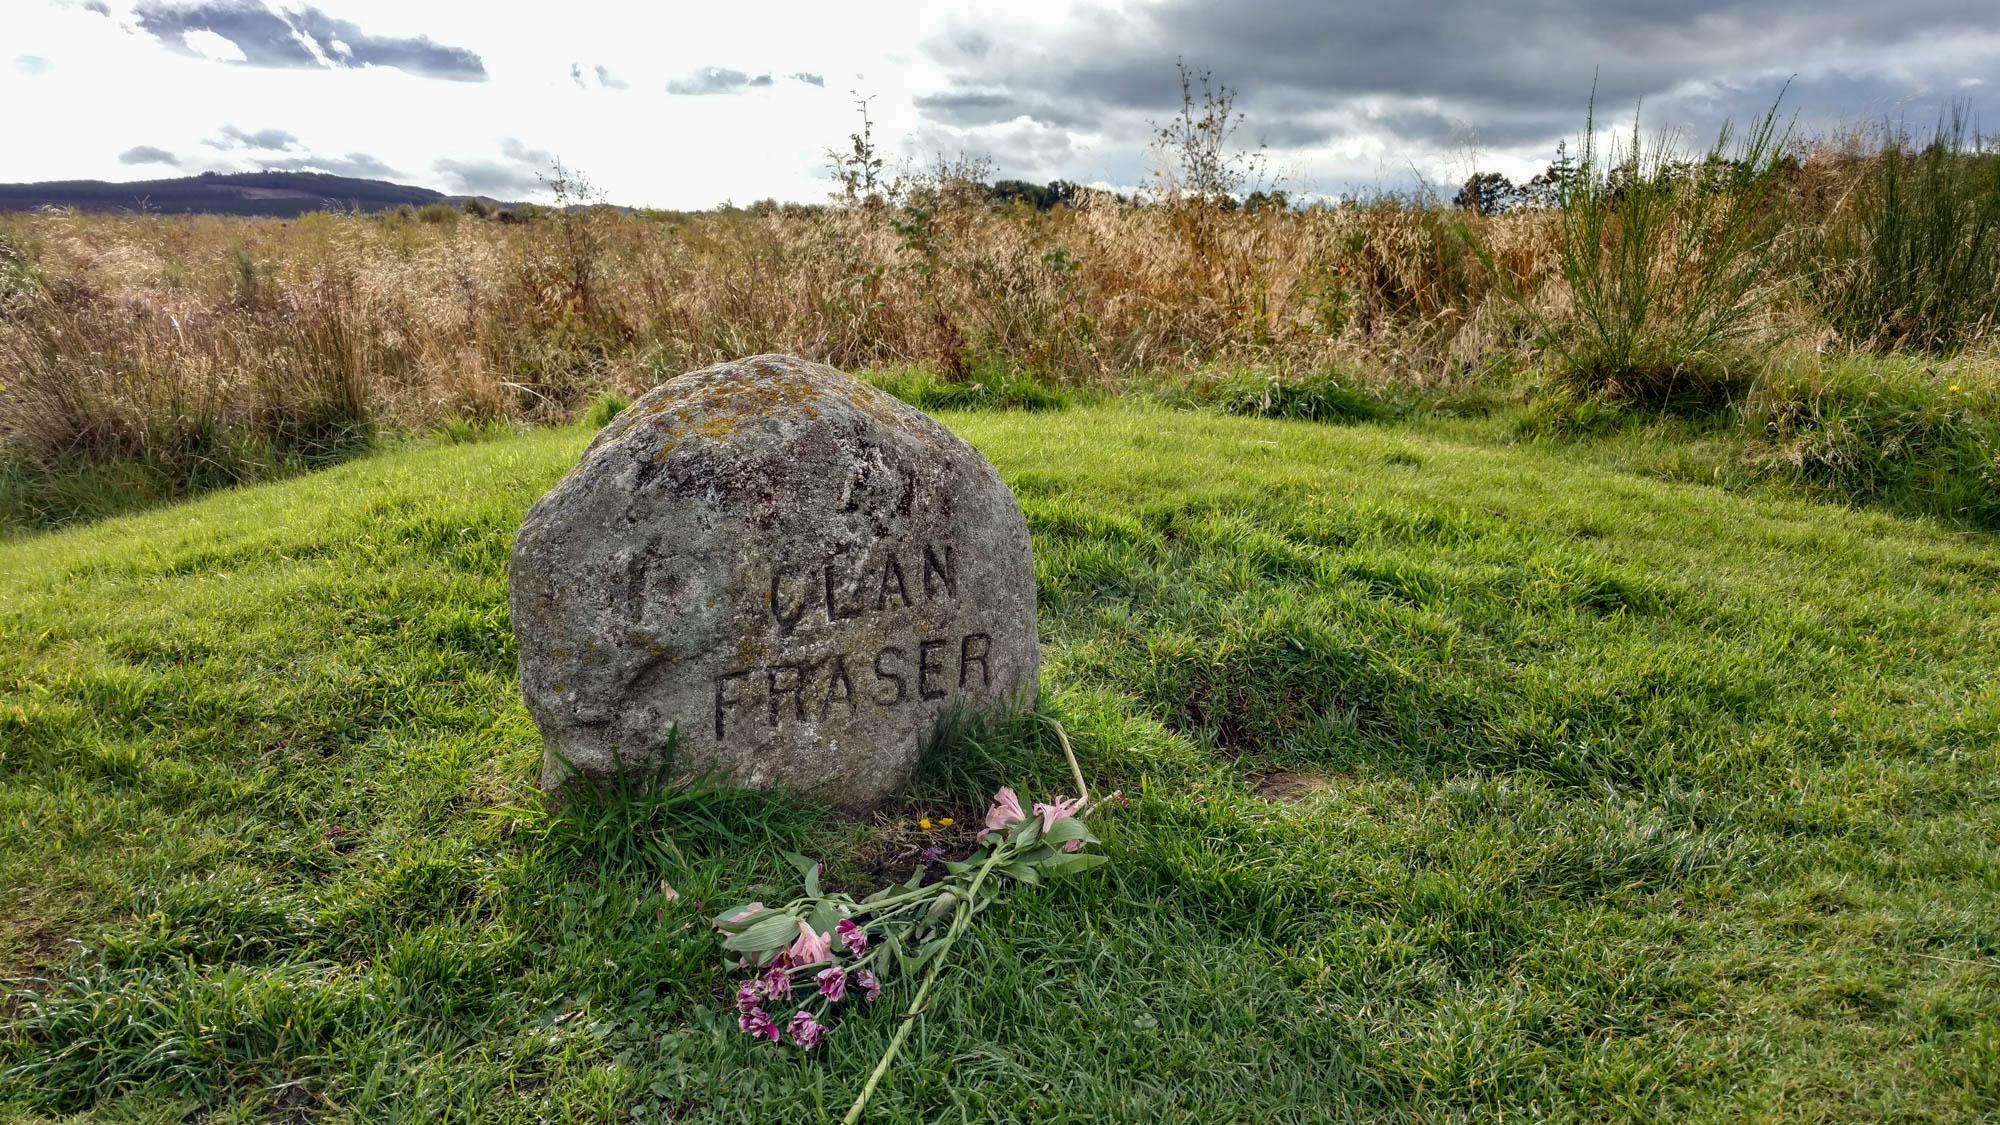 Fraser grave at Culloden